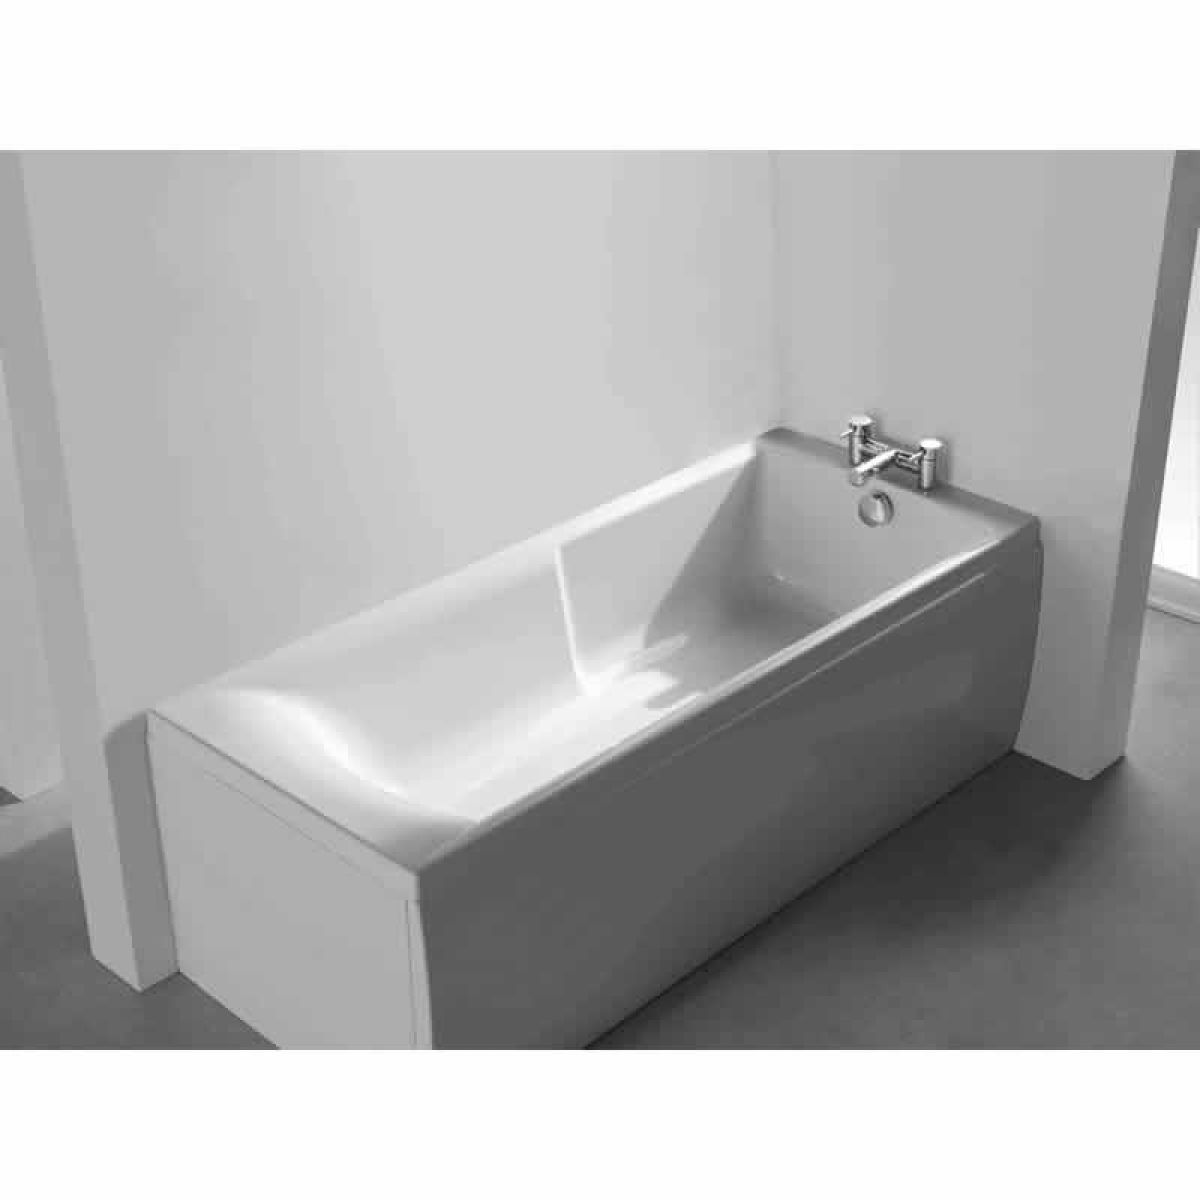 Roca almeria eco bath 1700 x 700mm uk bathrooms for Roca bathroom fittings